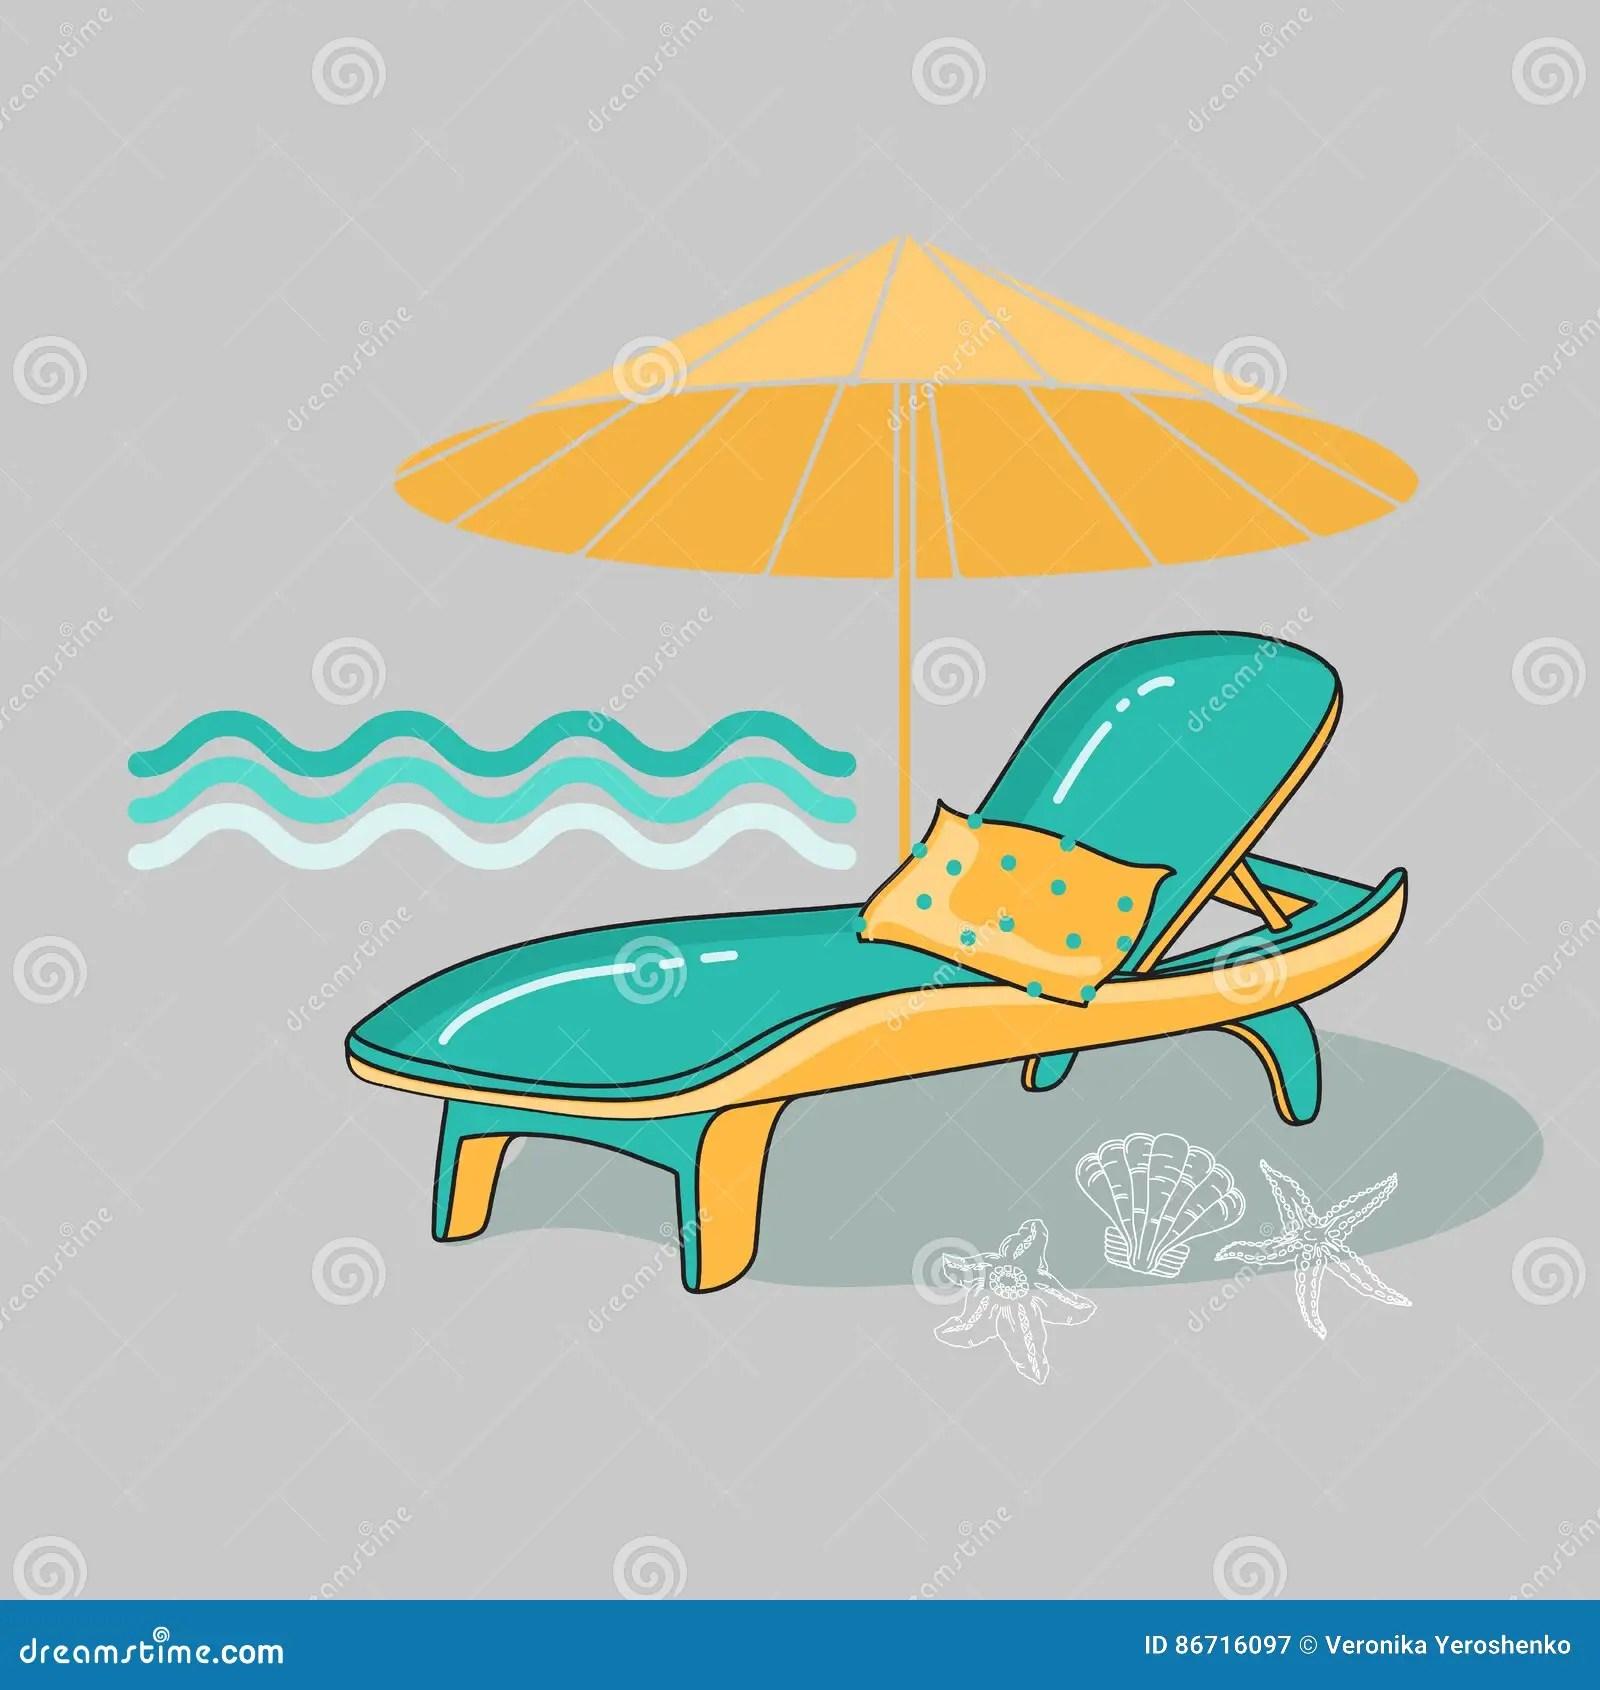 Vector Summer Cartoon Illustration Of Beach Lounge Chair